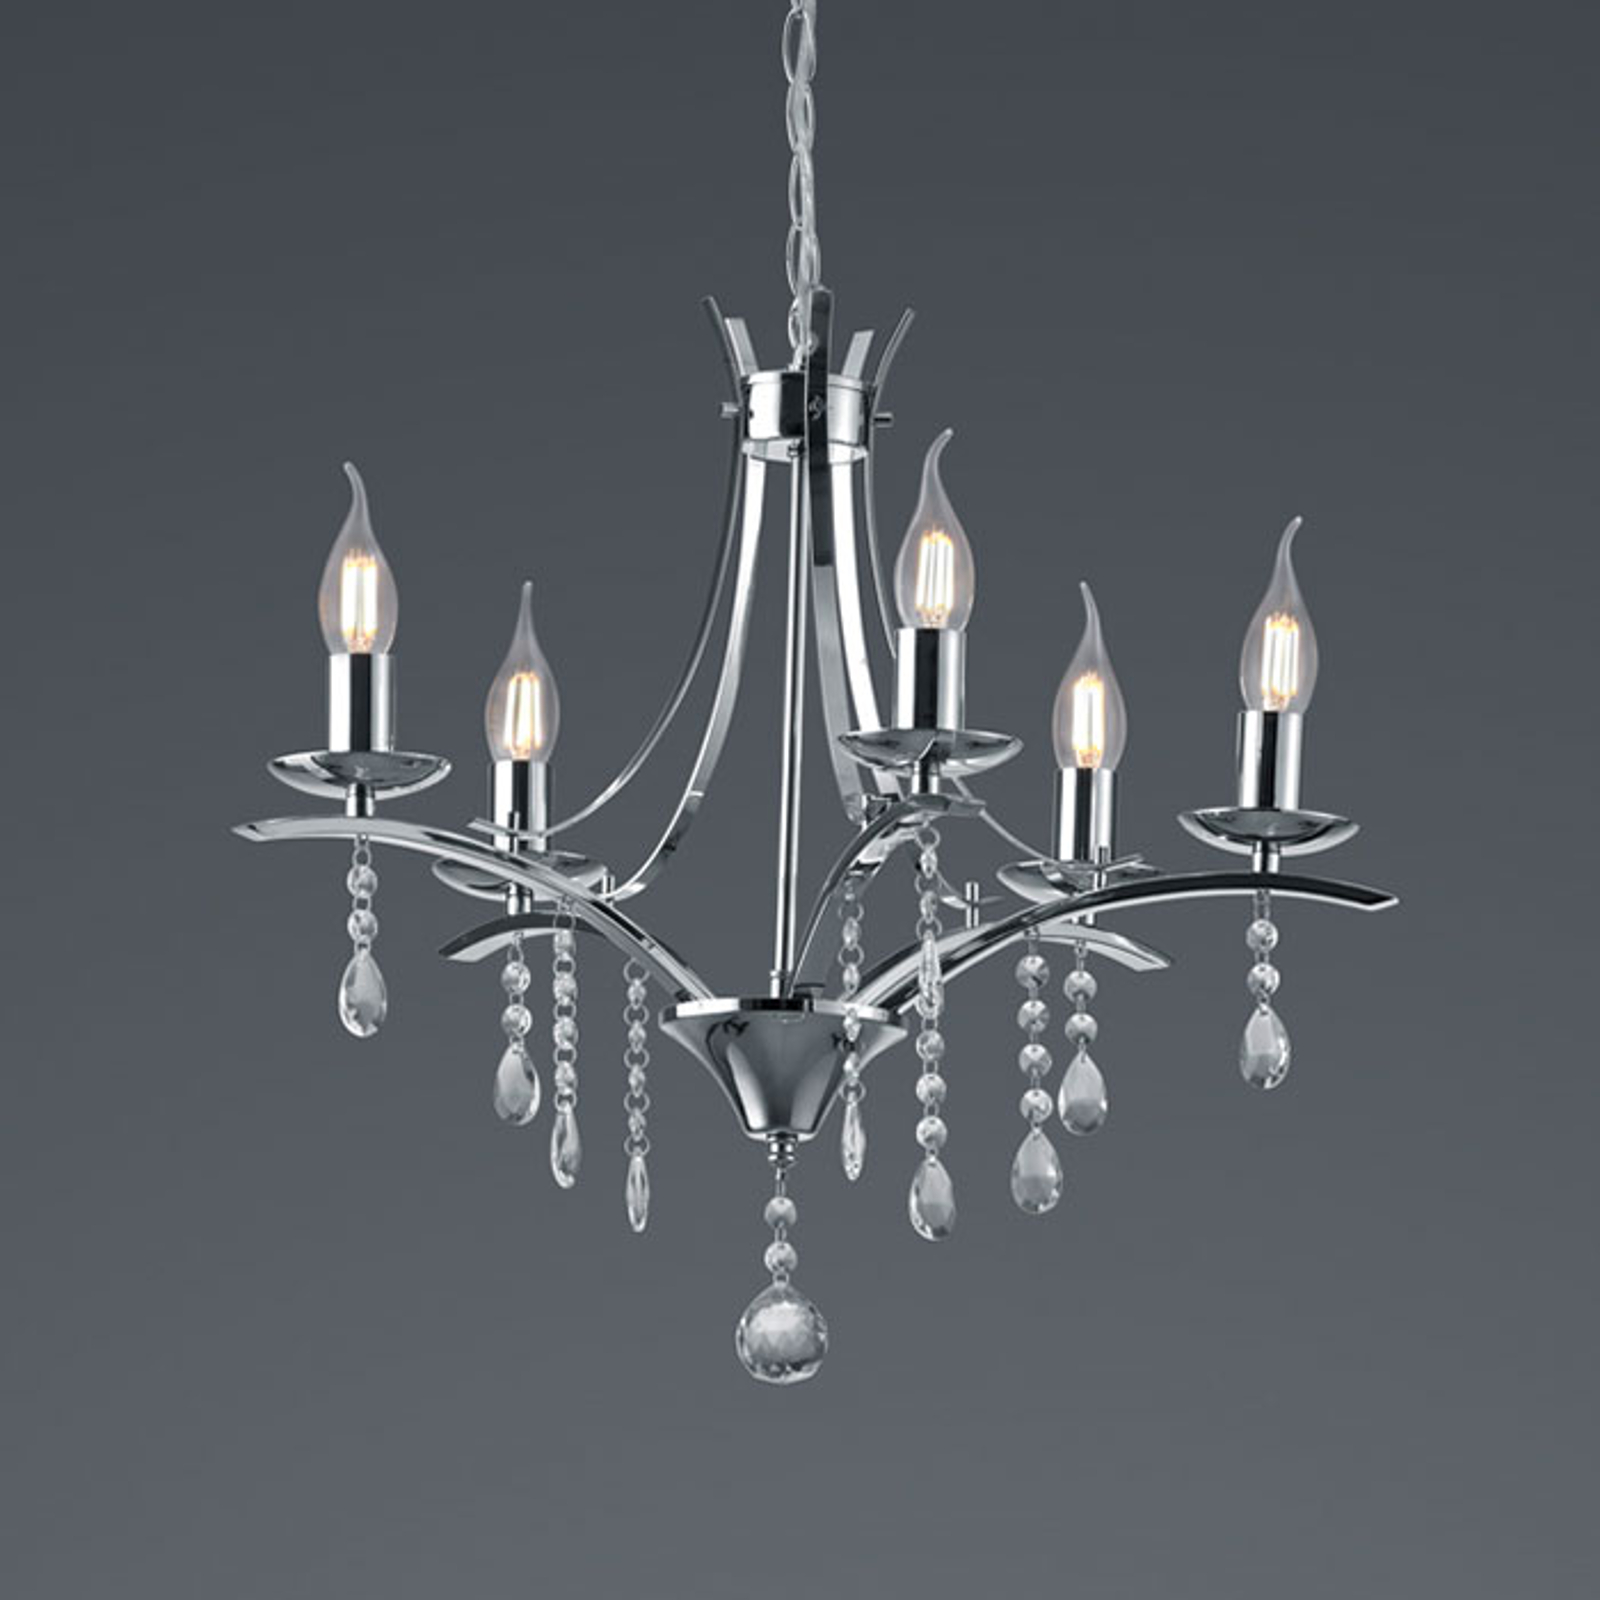 Applique Lucerna avec pendentif en verre, 5 lampes